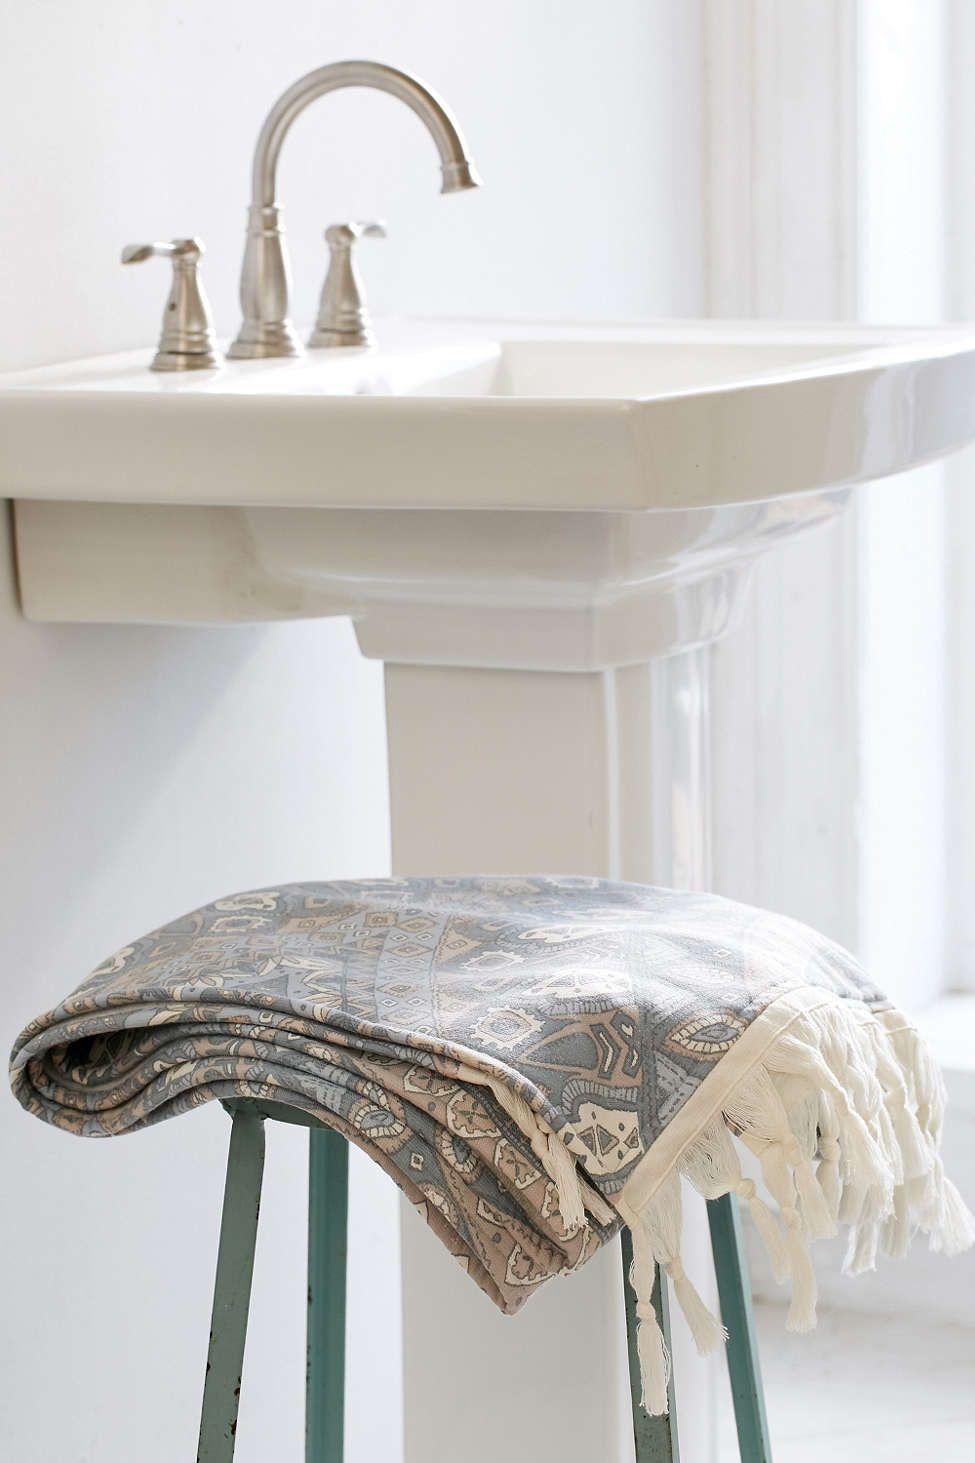 Velma bath towel towels bath and master bedroom